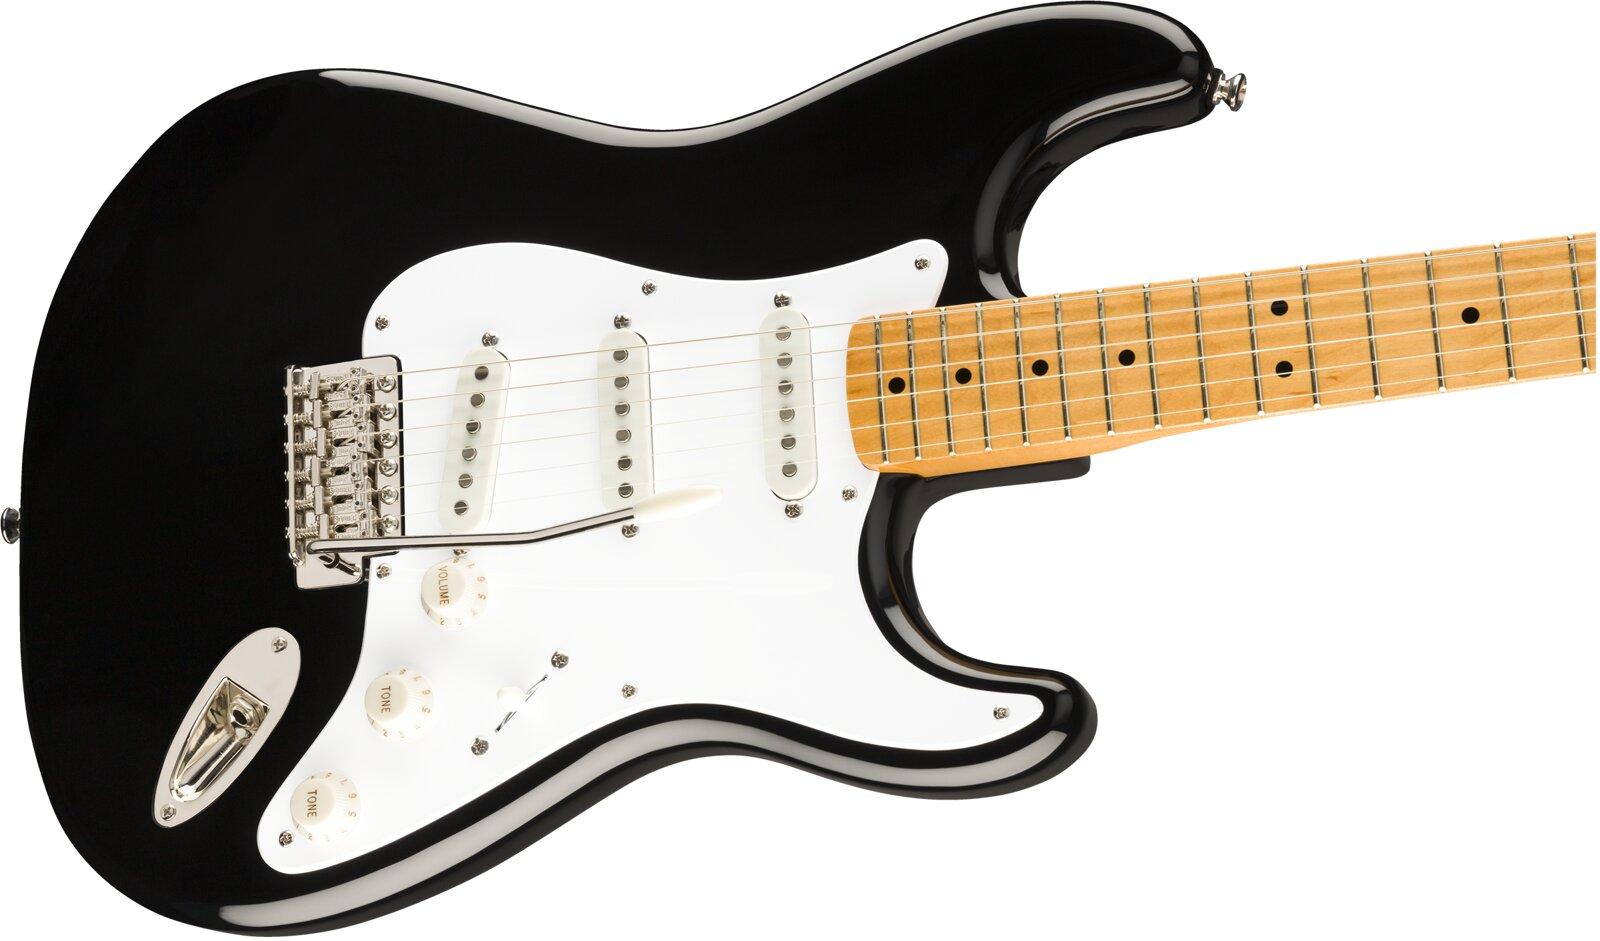 Squier Classic Vibe '50s Stratocaster Maple Fingerboard Black : photo 3